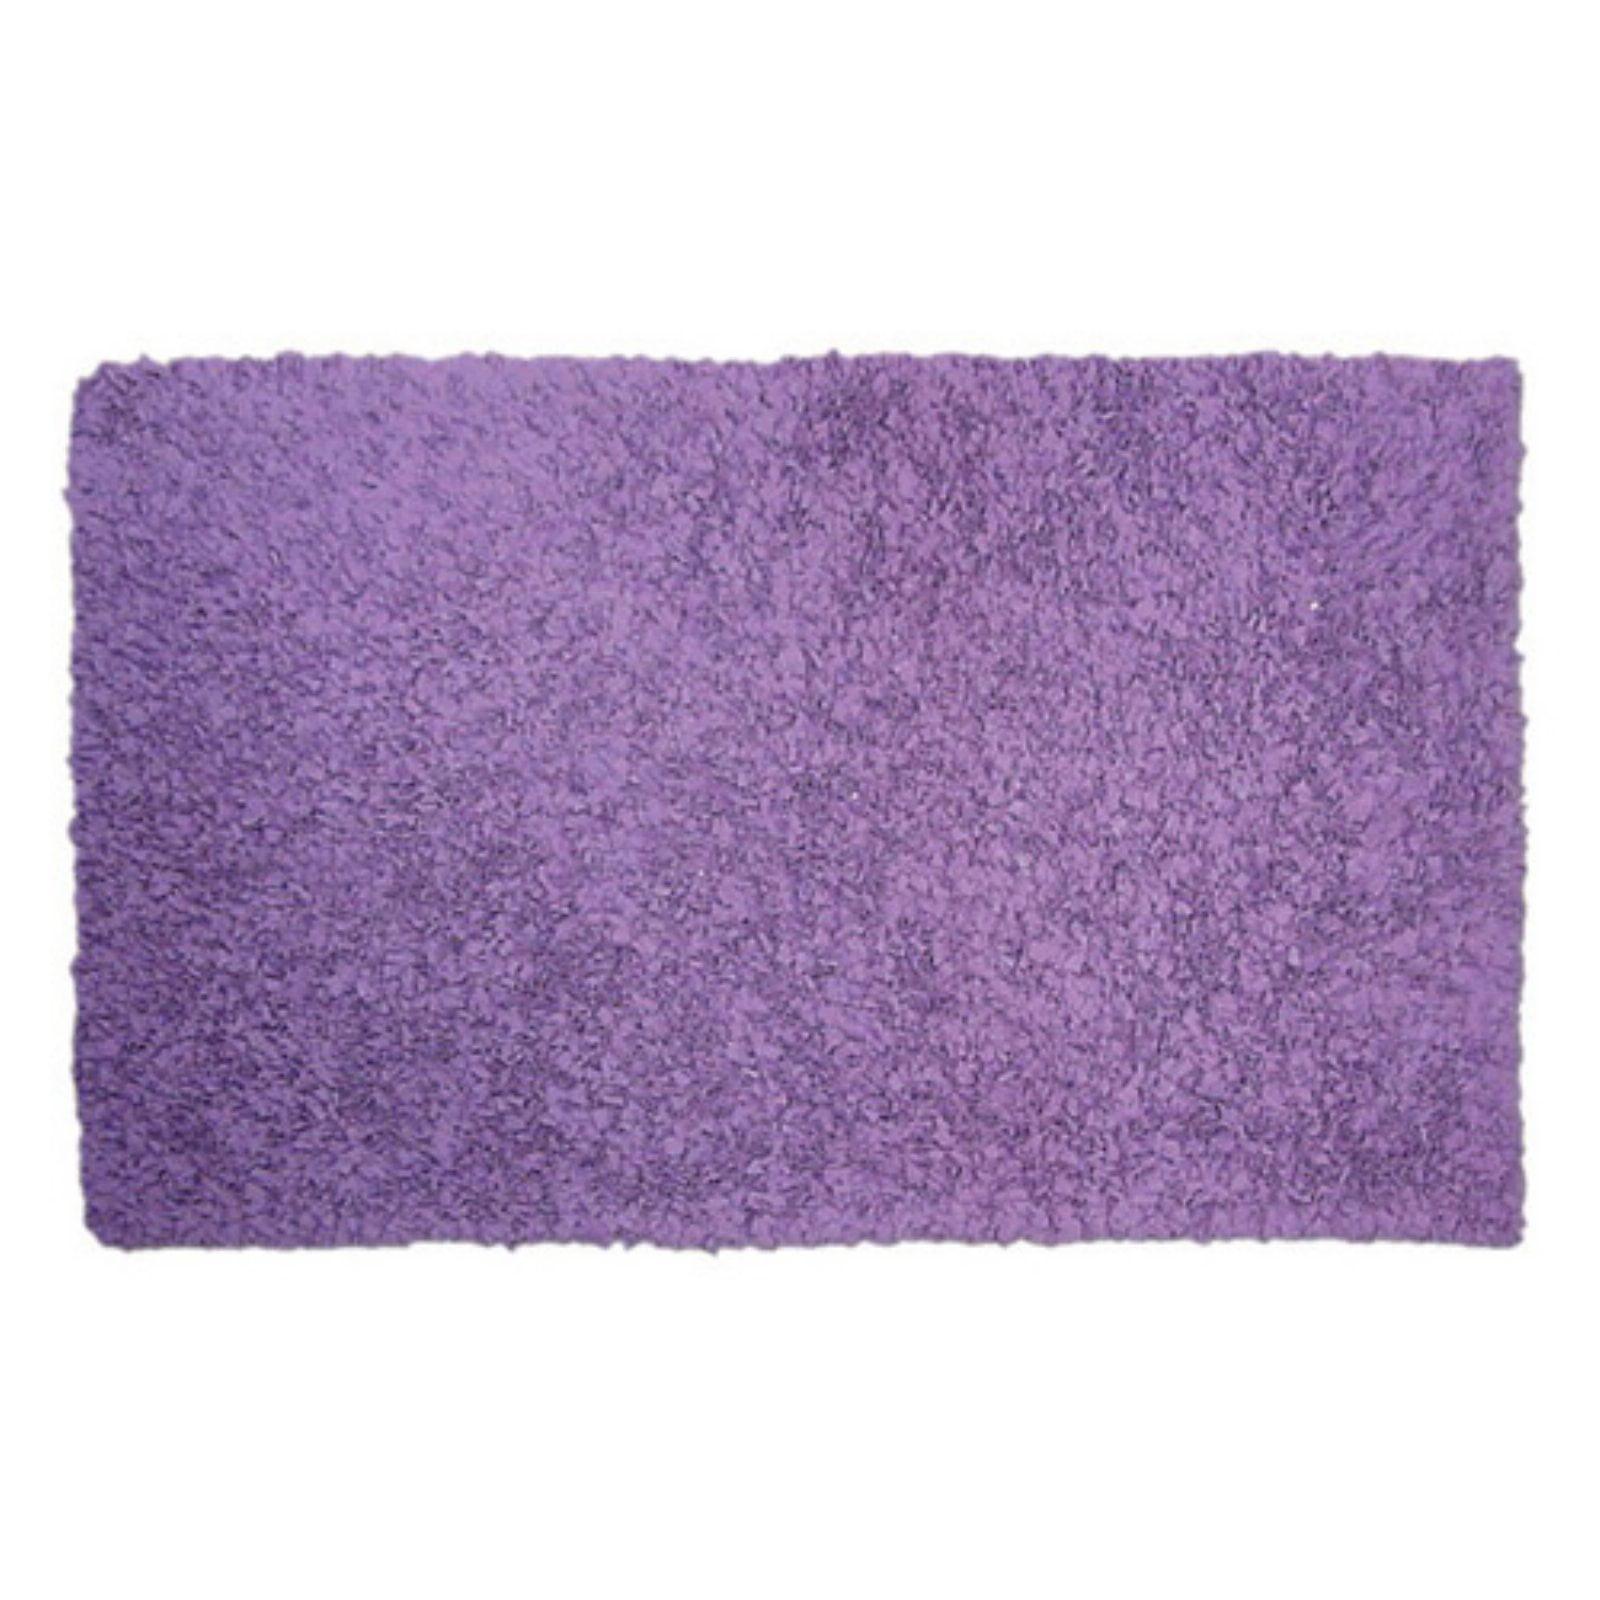 The Rug Market Shaggy Raggy Purple Area Rug, Size 2.8' x 4.8'